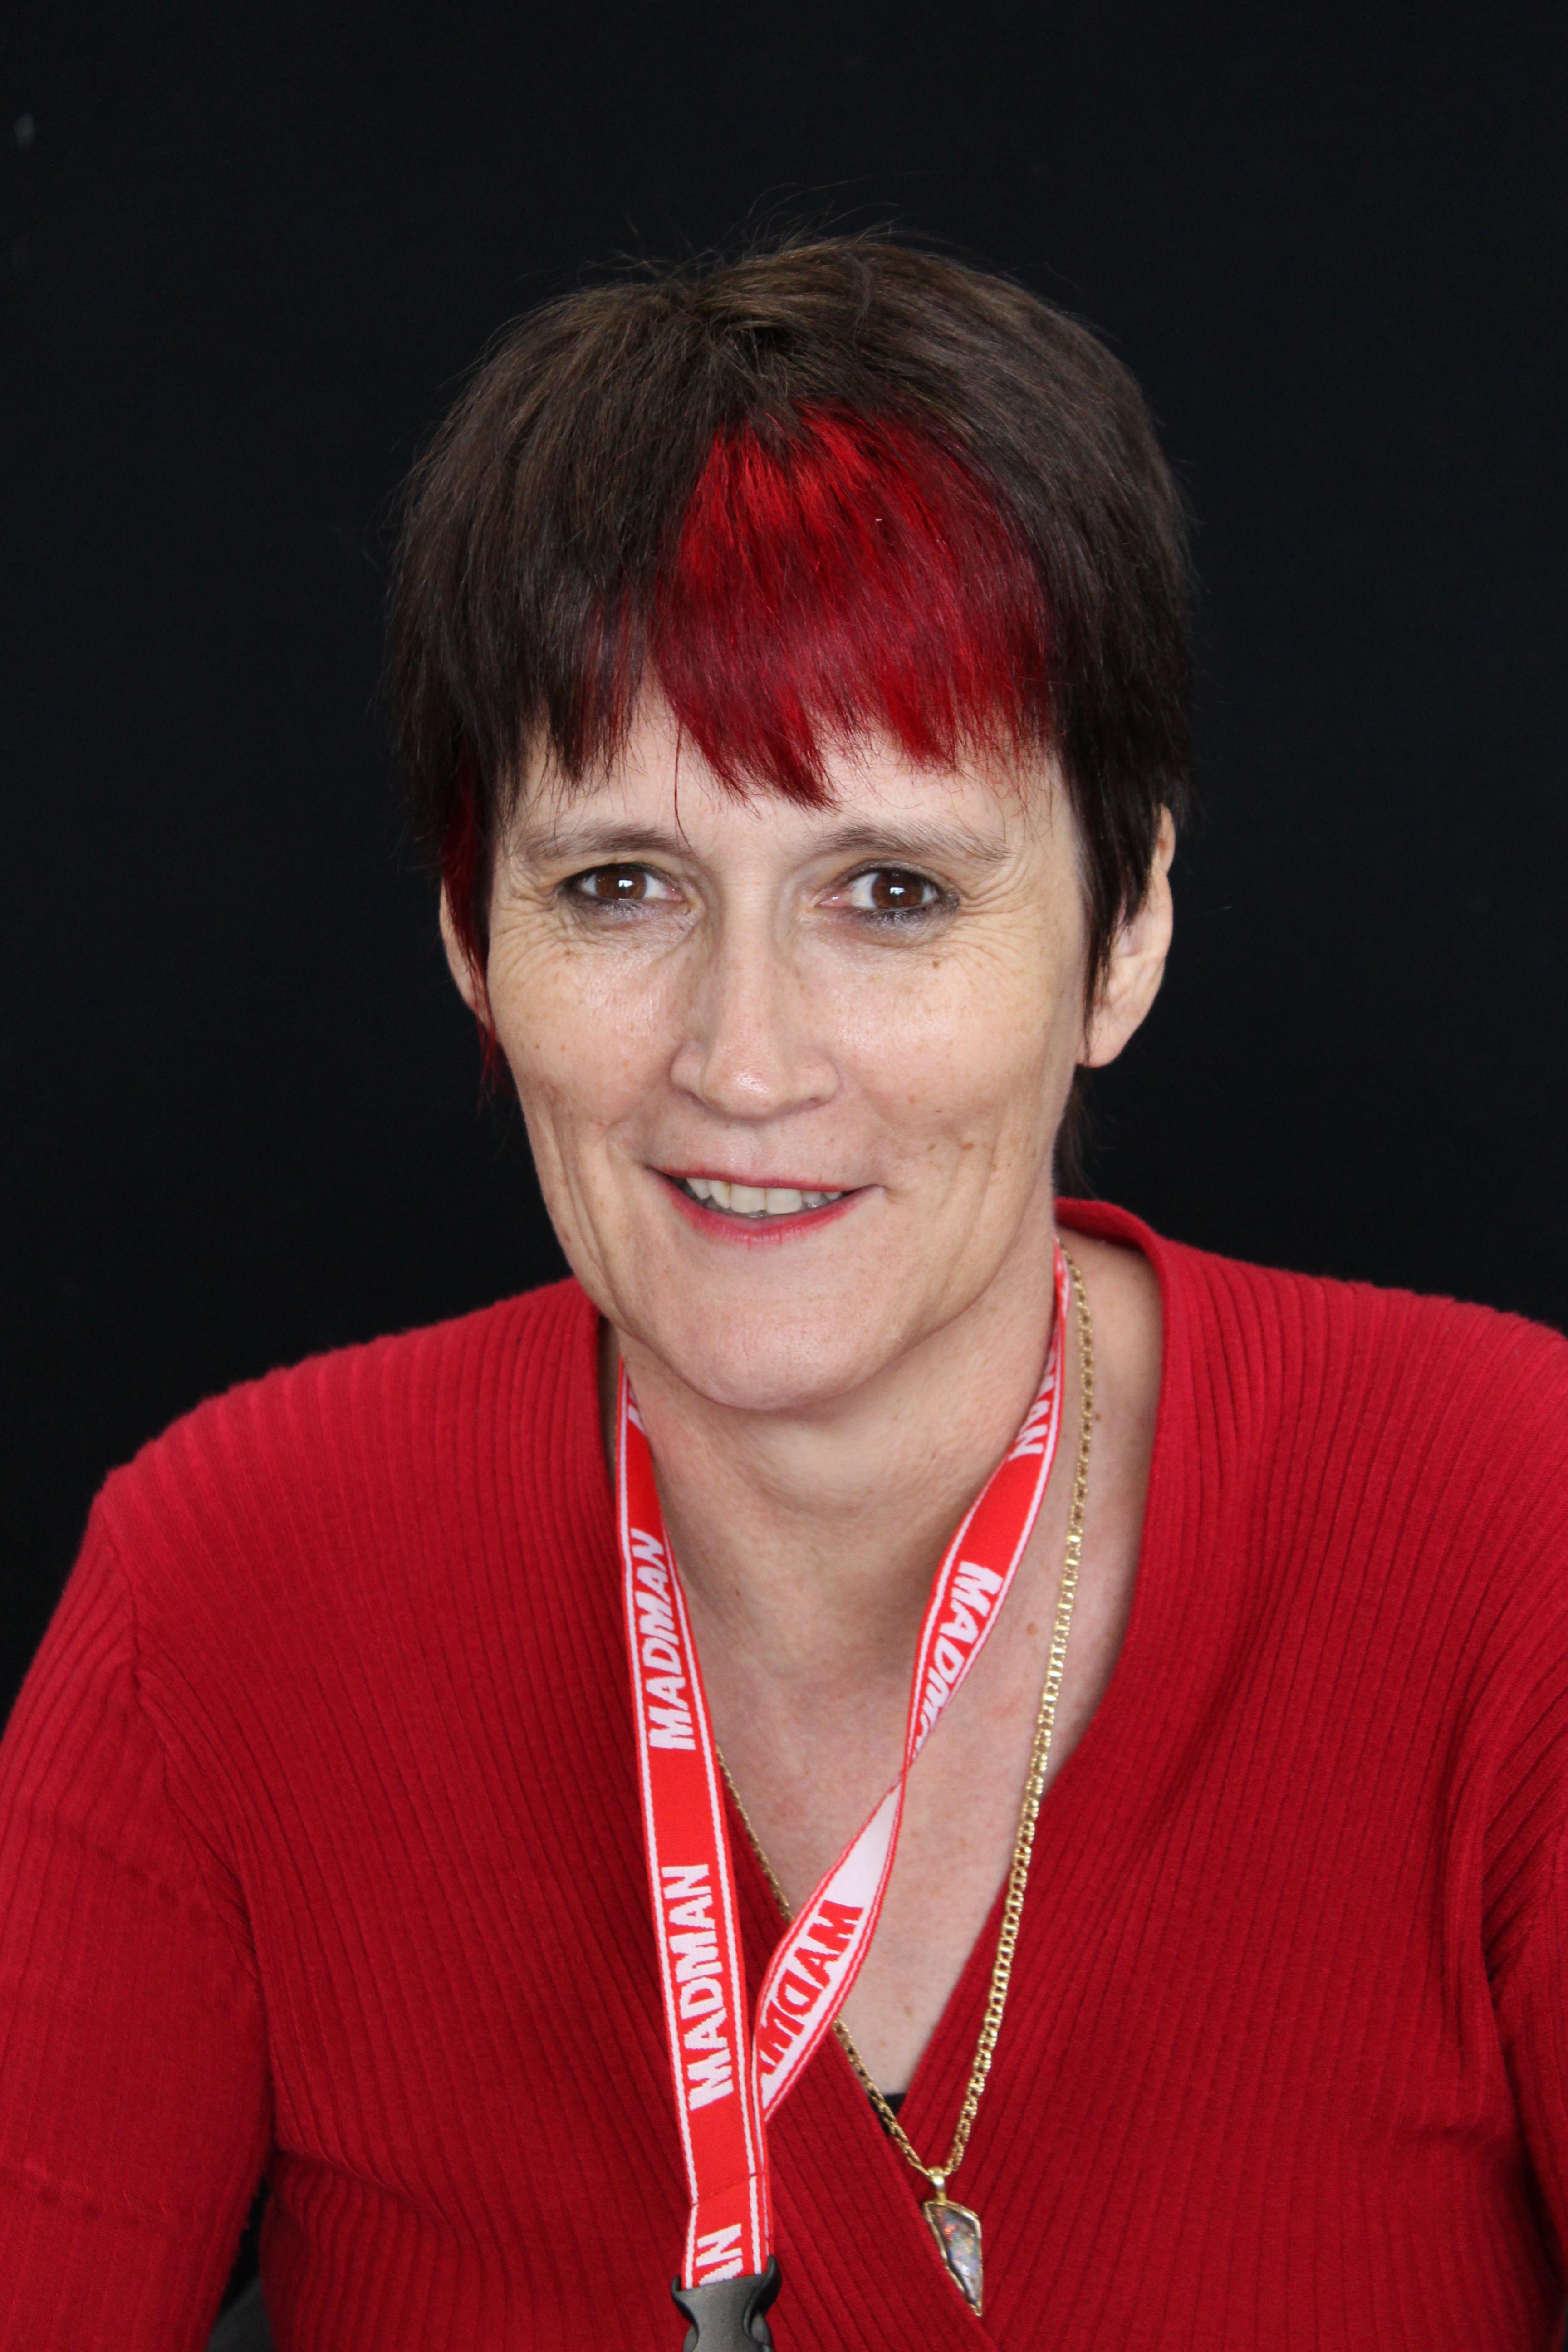 Marianne de Pierres